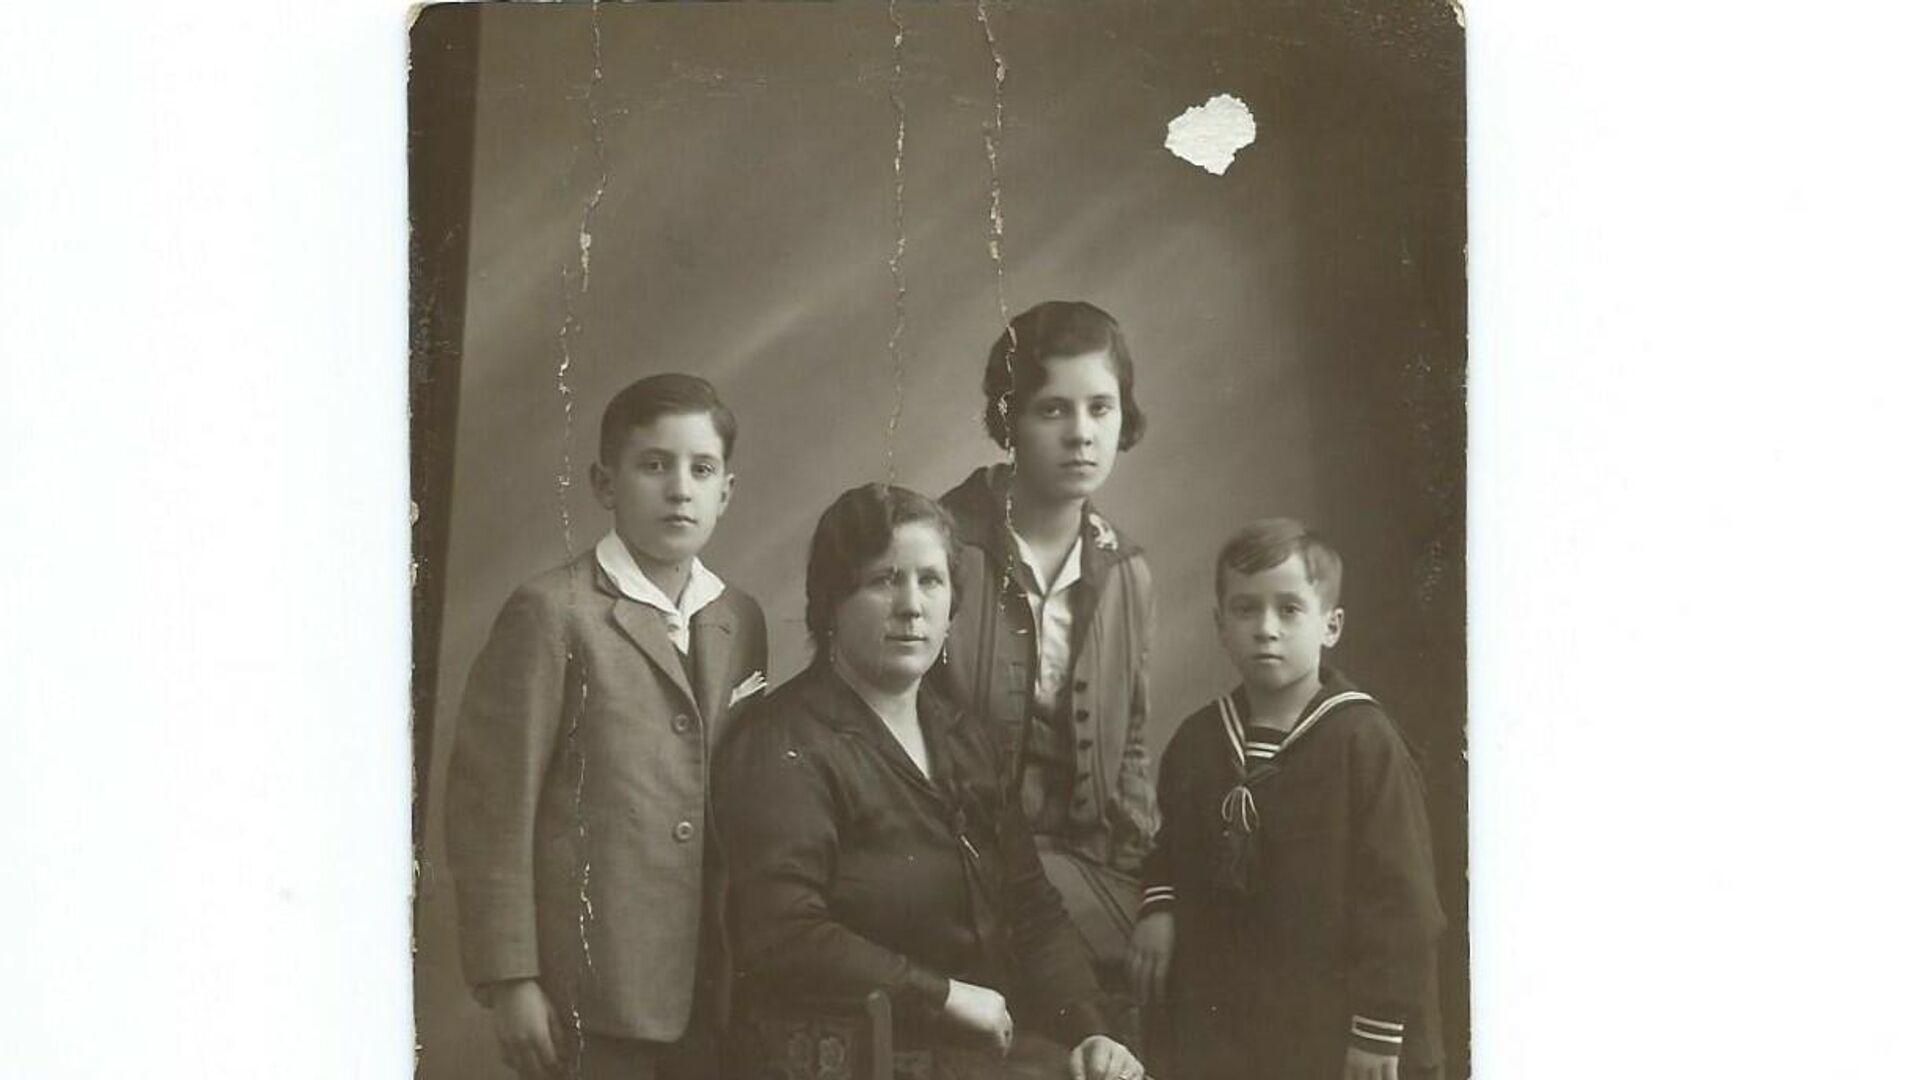 Familia Aguirregoicoa - Sputnik Mundo, 1920, 08.03.2021